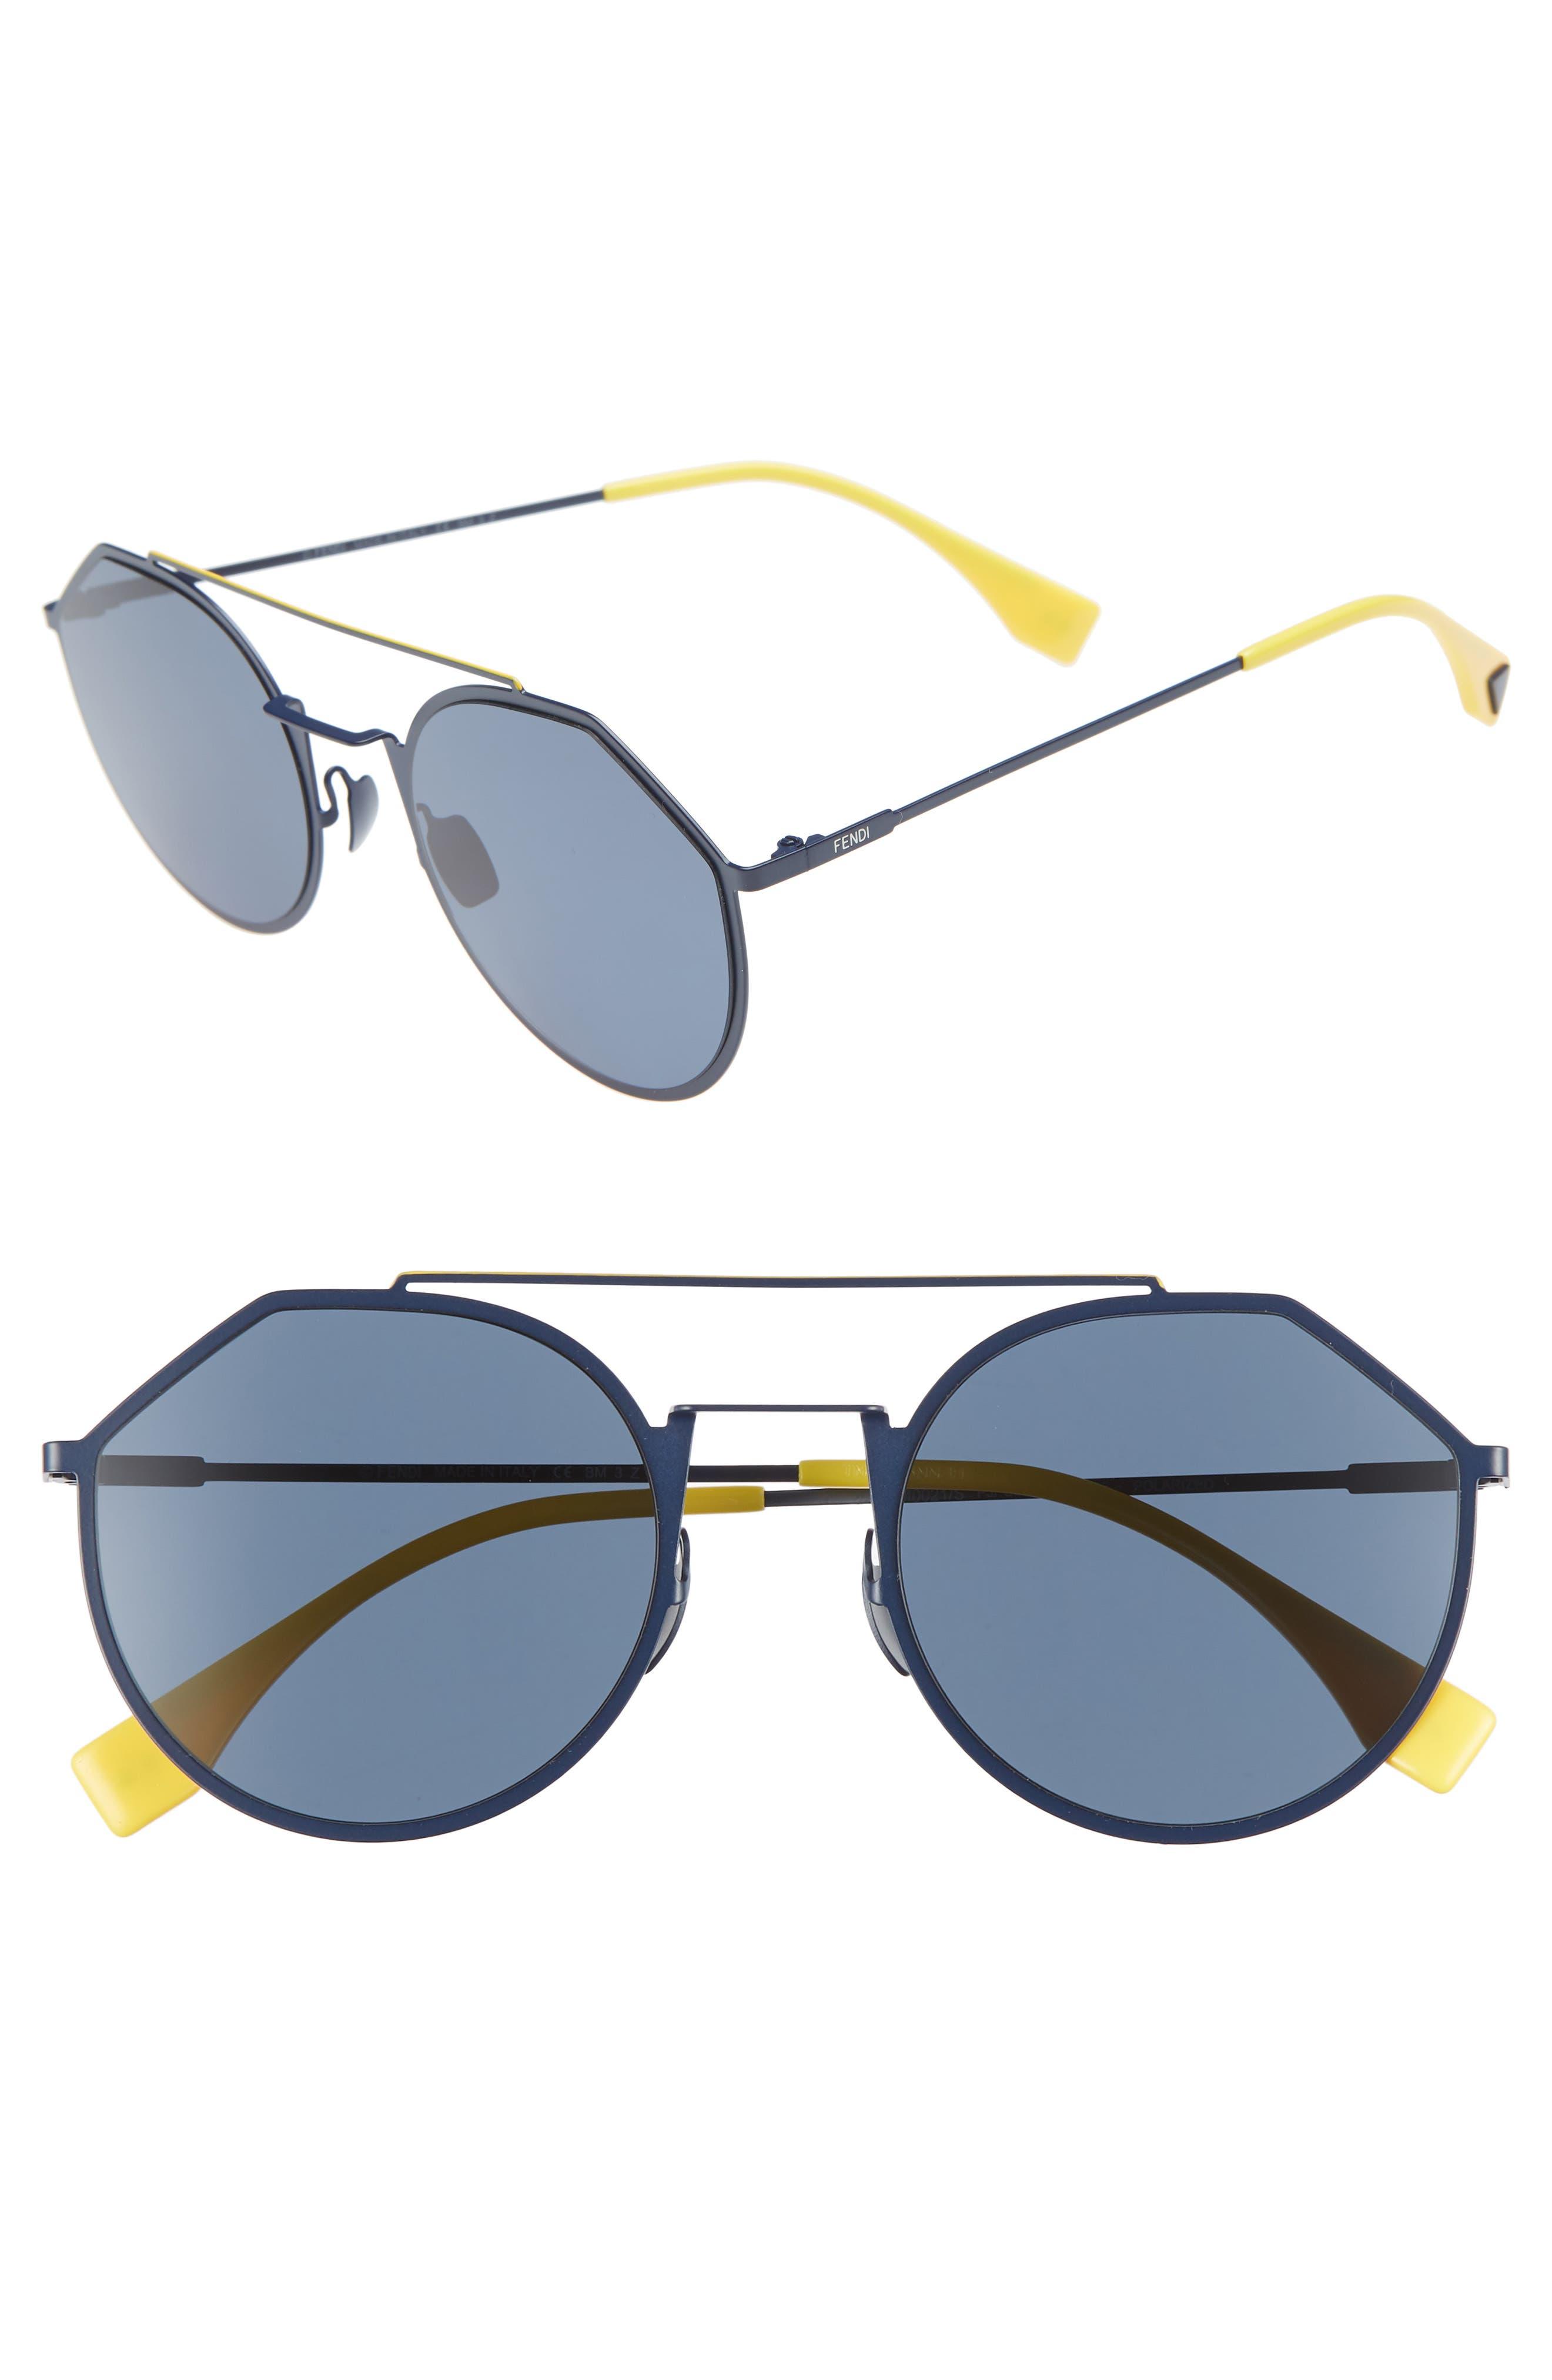 54mm Polarized Round Sunglasses,                             Main thumbnail 1, color,                             BLUE